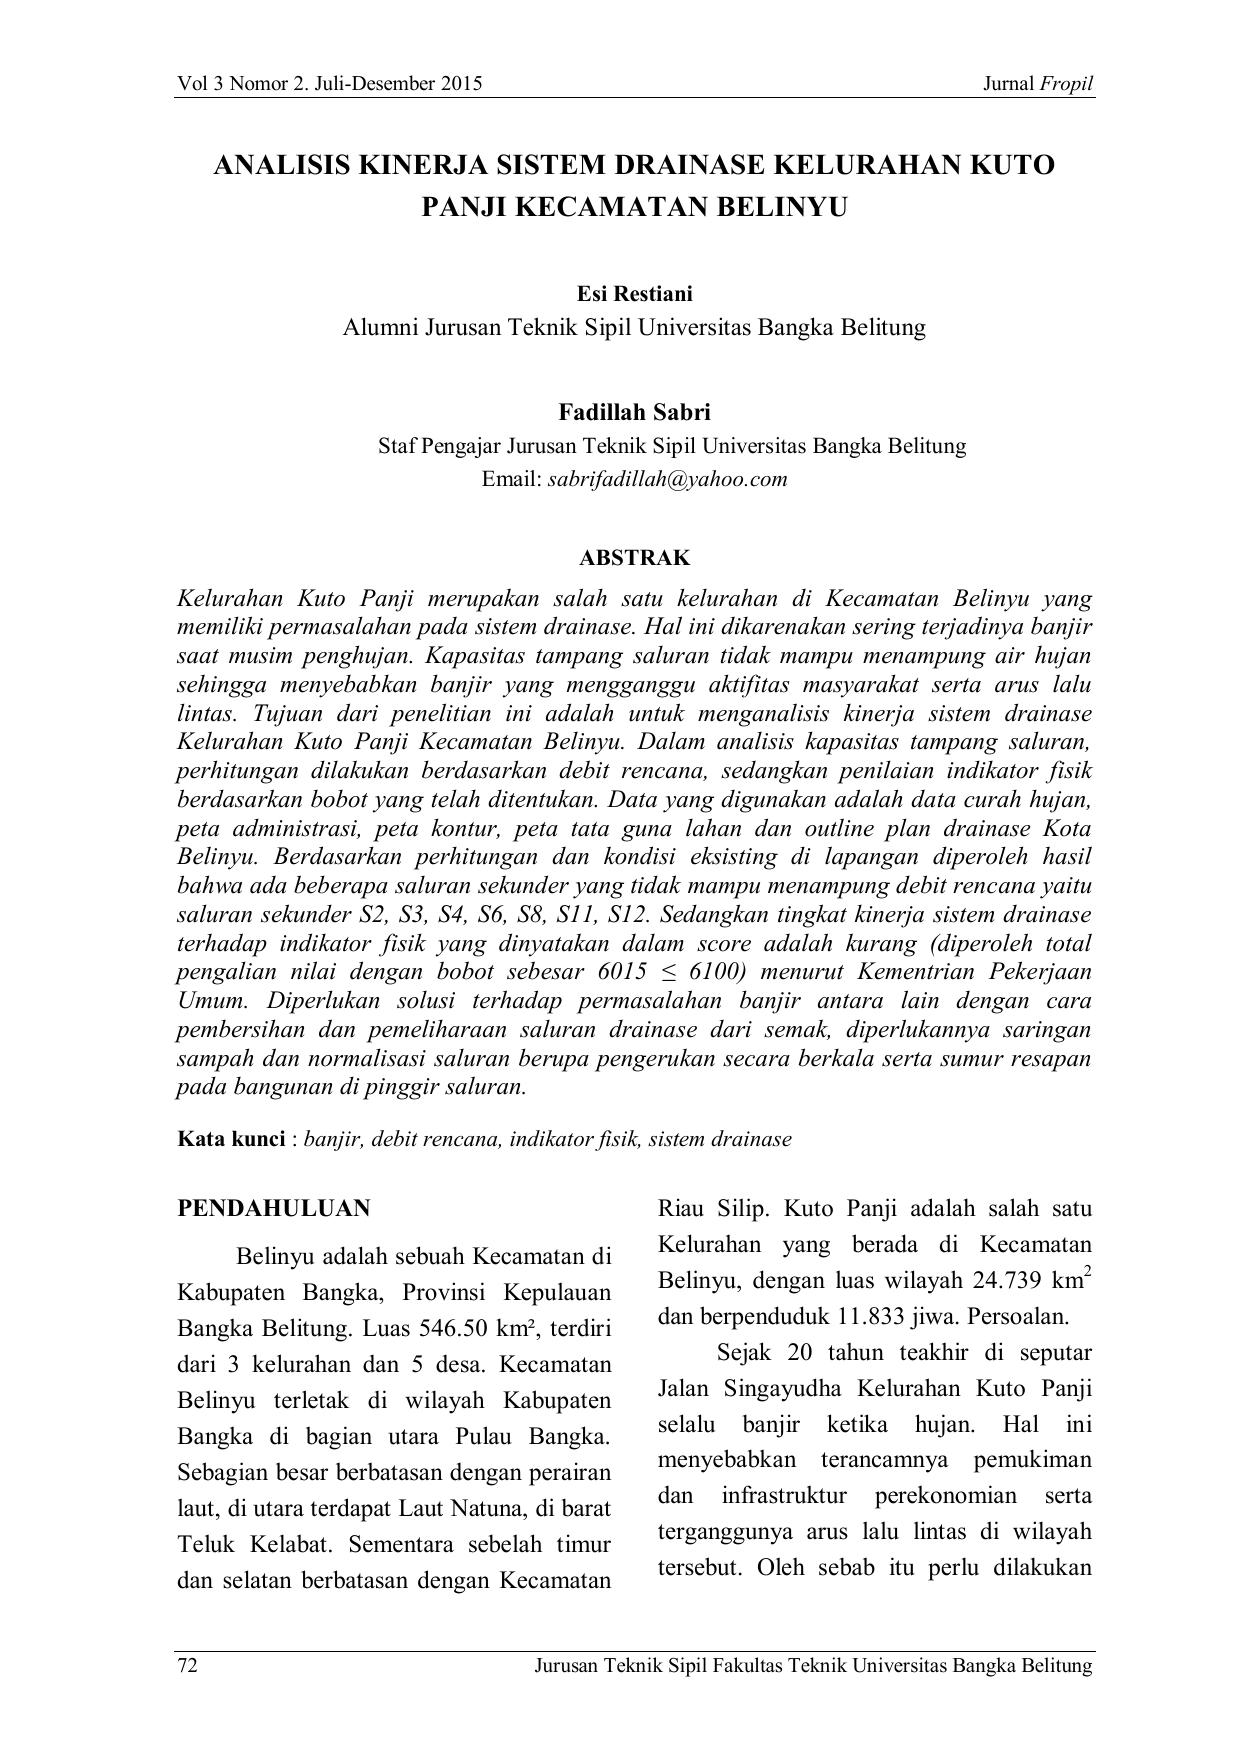 Analisis Kinerja Sistem Drainase Kelurahan Kuto Panji